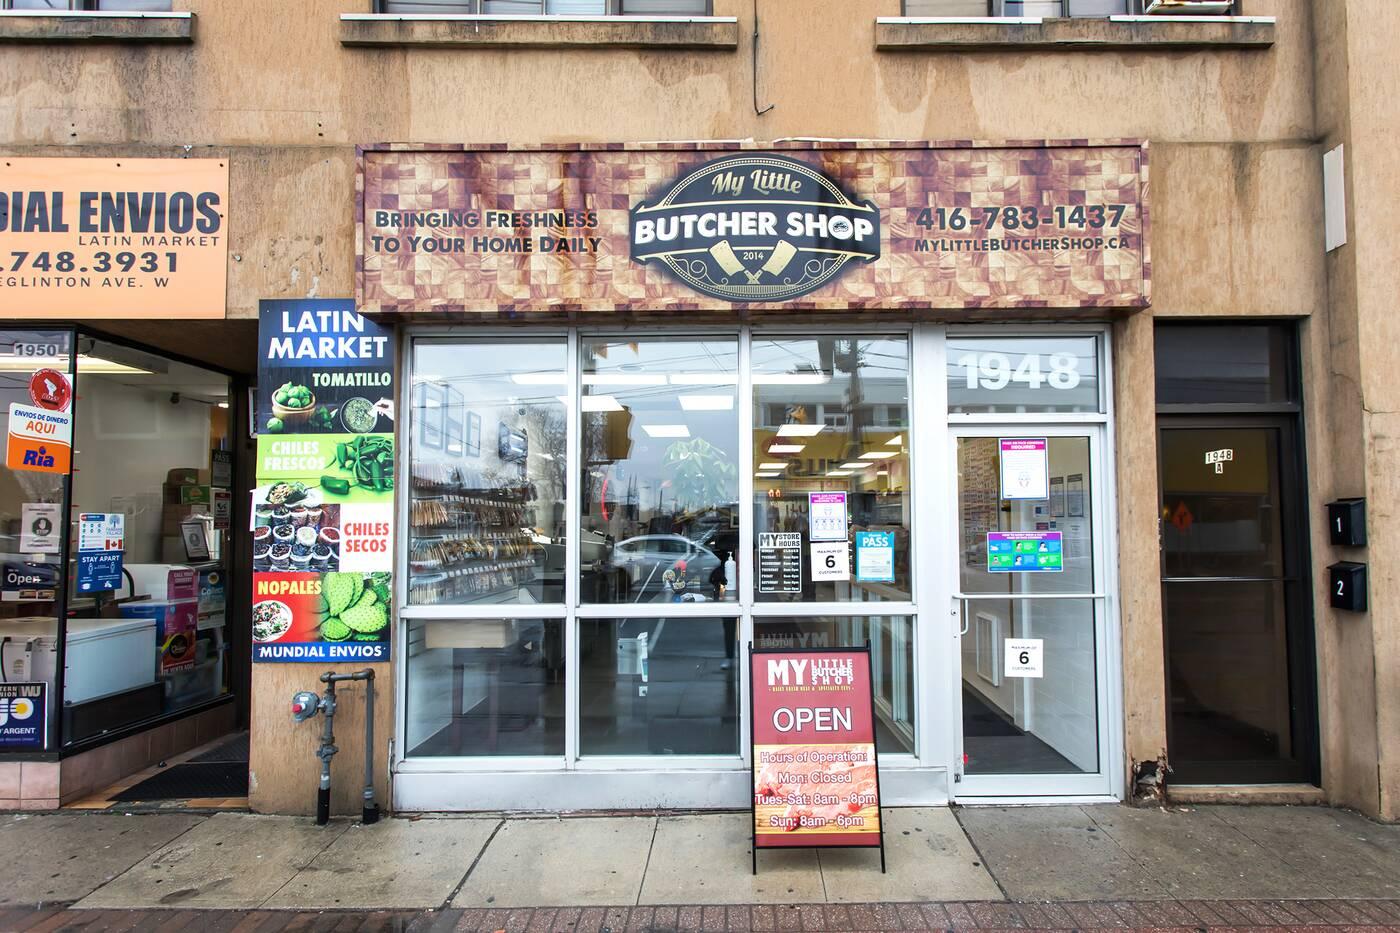 My Little Butcher Shop Toronto